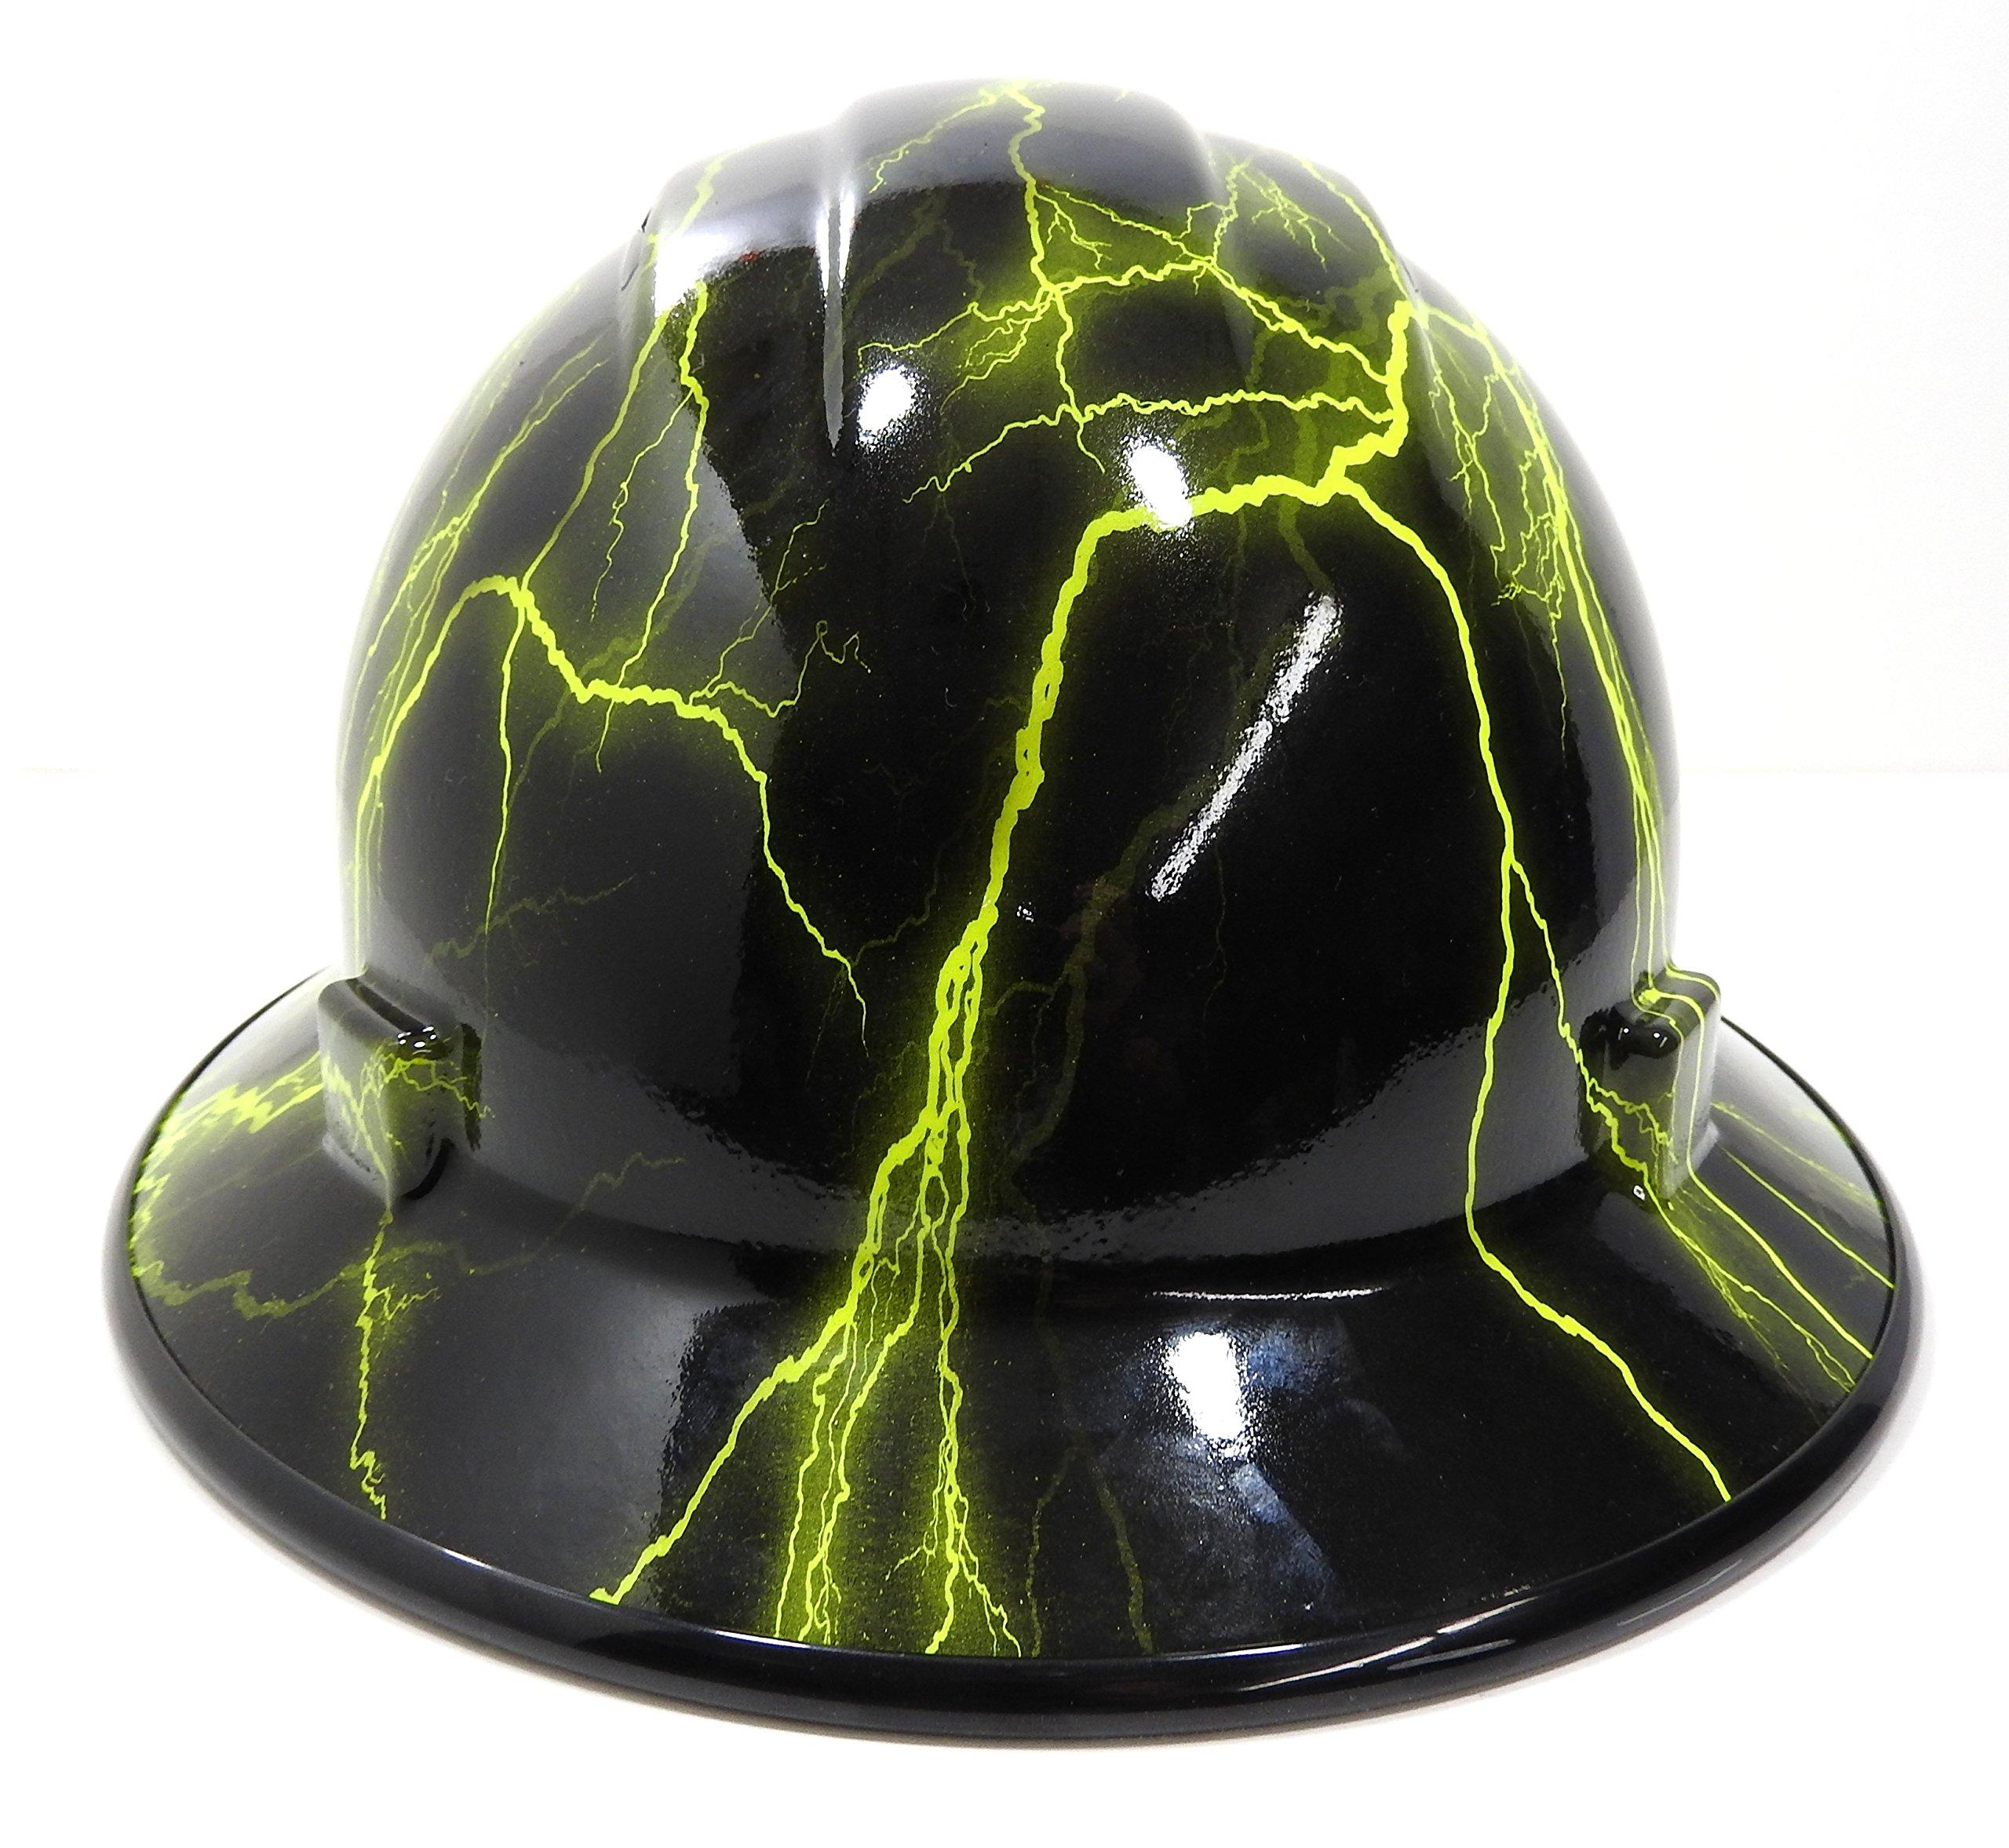 HardHatGear Custom Hydro Dipped VENTED Full Brim Hard Hat in 'Hi Viz Lightning' - Made in USA by Hardhatgear (Image #2)